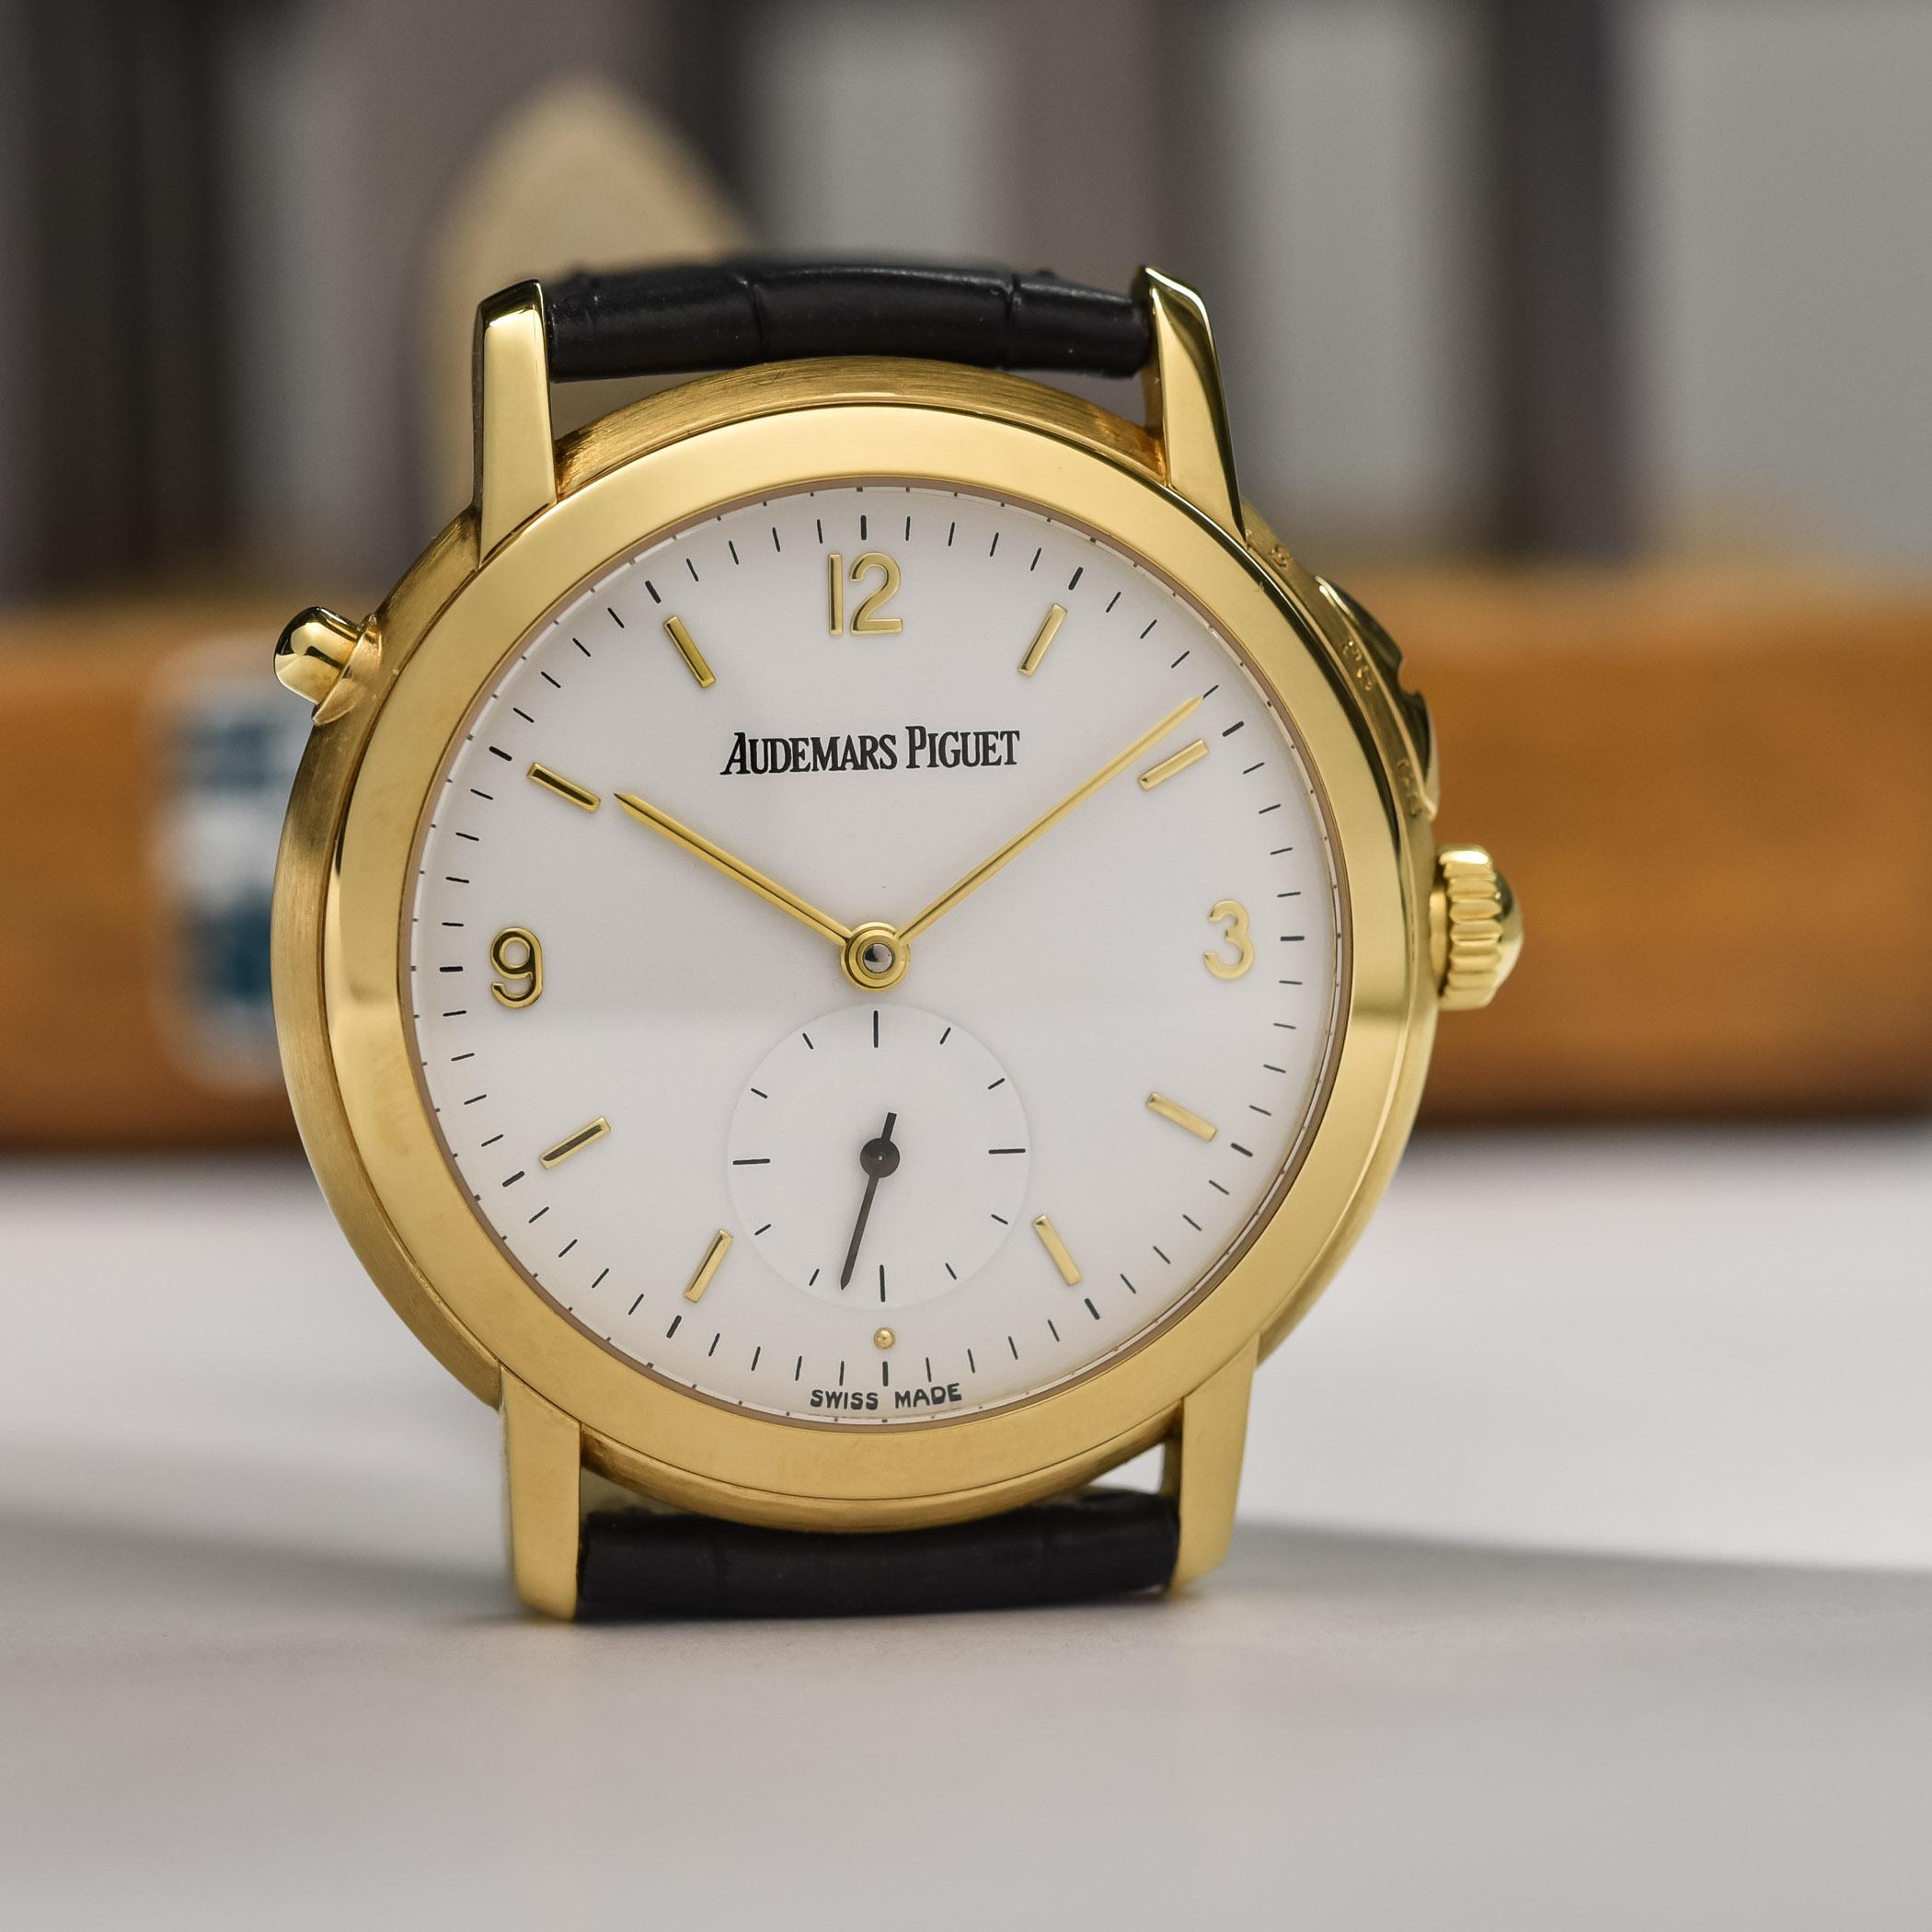 Audemars Piguet quarter repeating grande and petite sonnerie wristwatch 25750BA calibre 2868